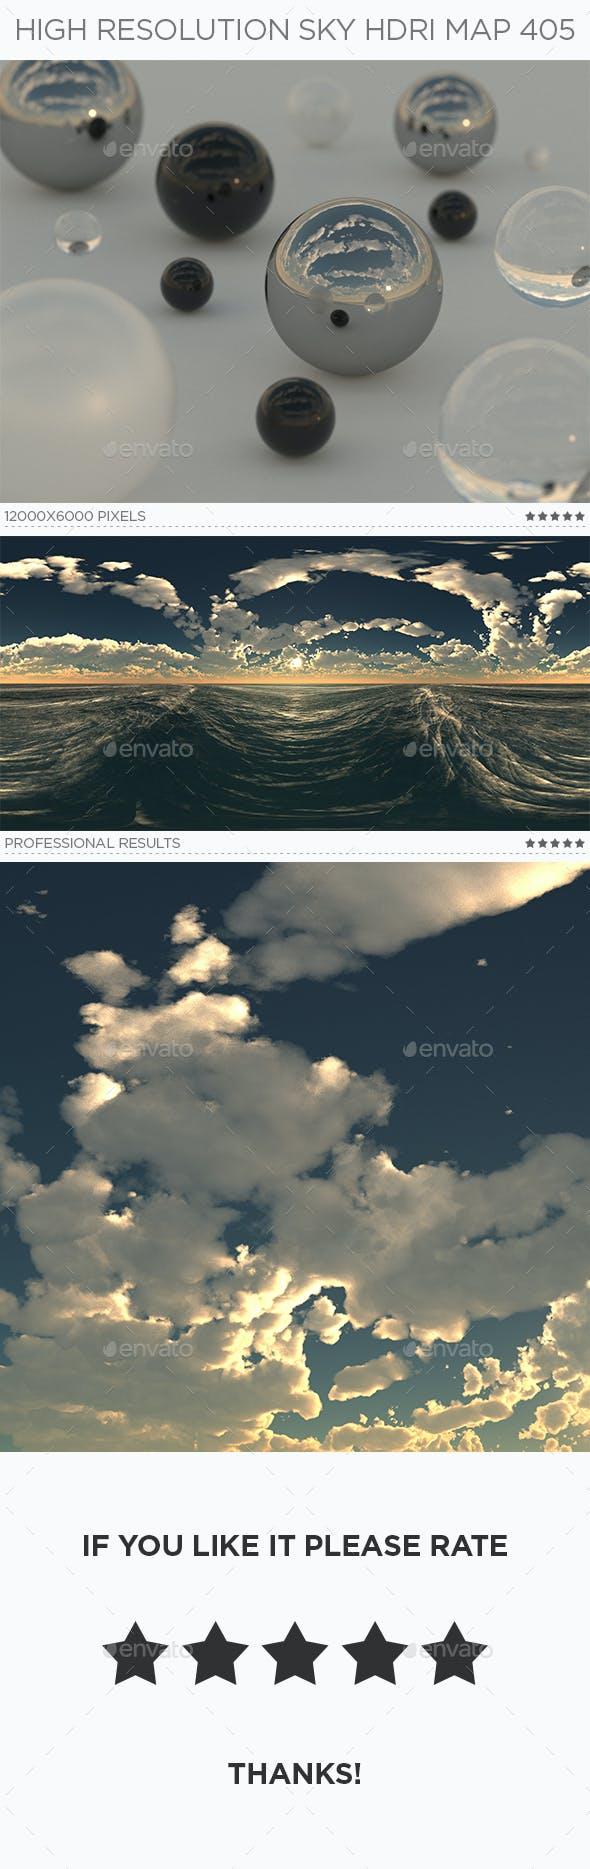 High Resolution Sky HDRi Map 405 - 3DOcean Item for Sale